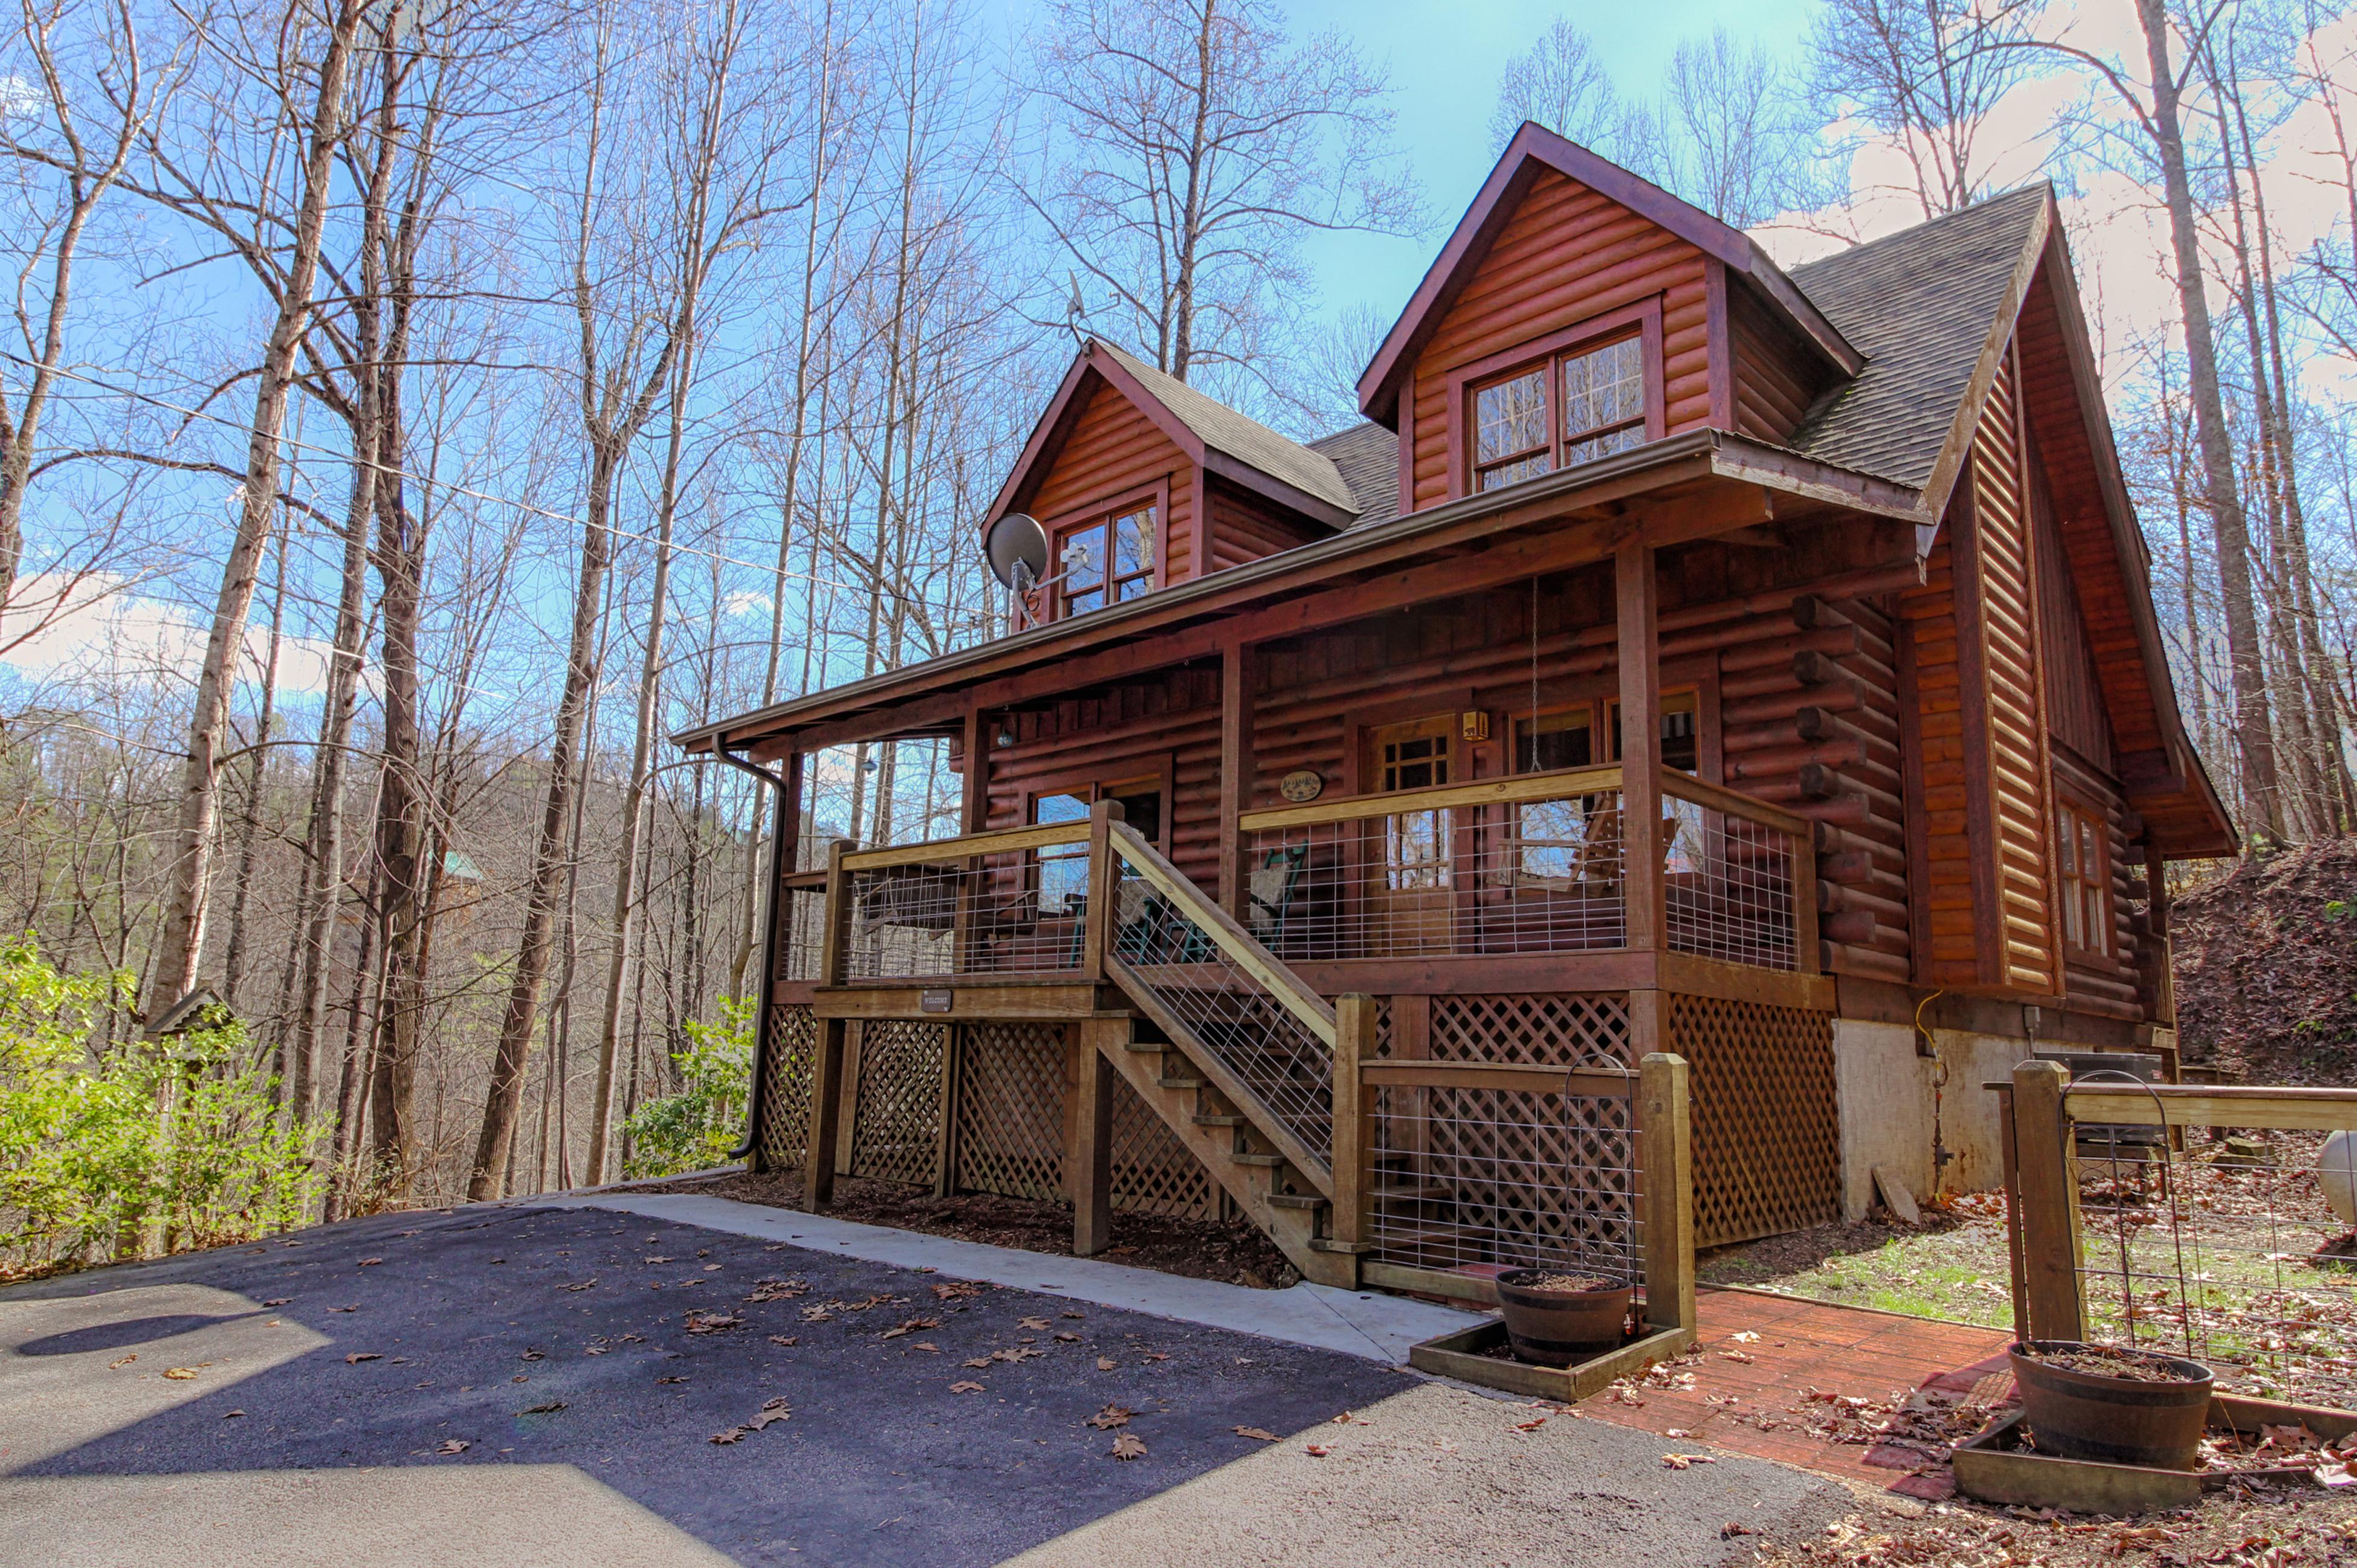 cabins black cabin hills lodging adventure dakota add favorite last vacation south rentals minute